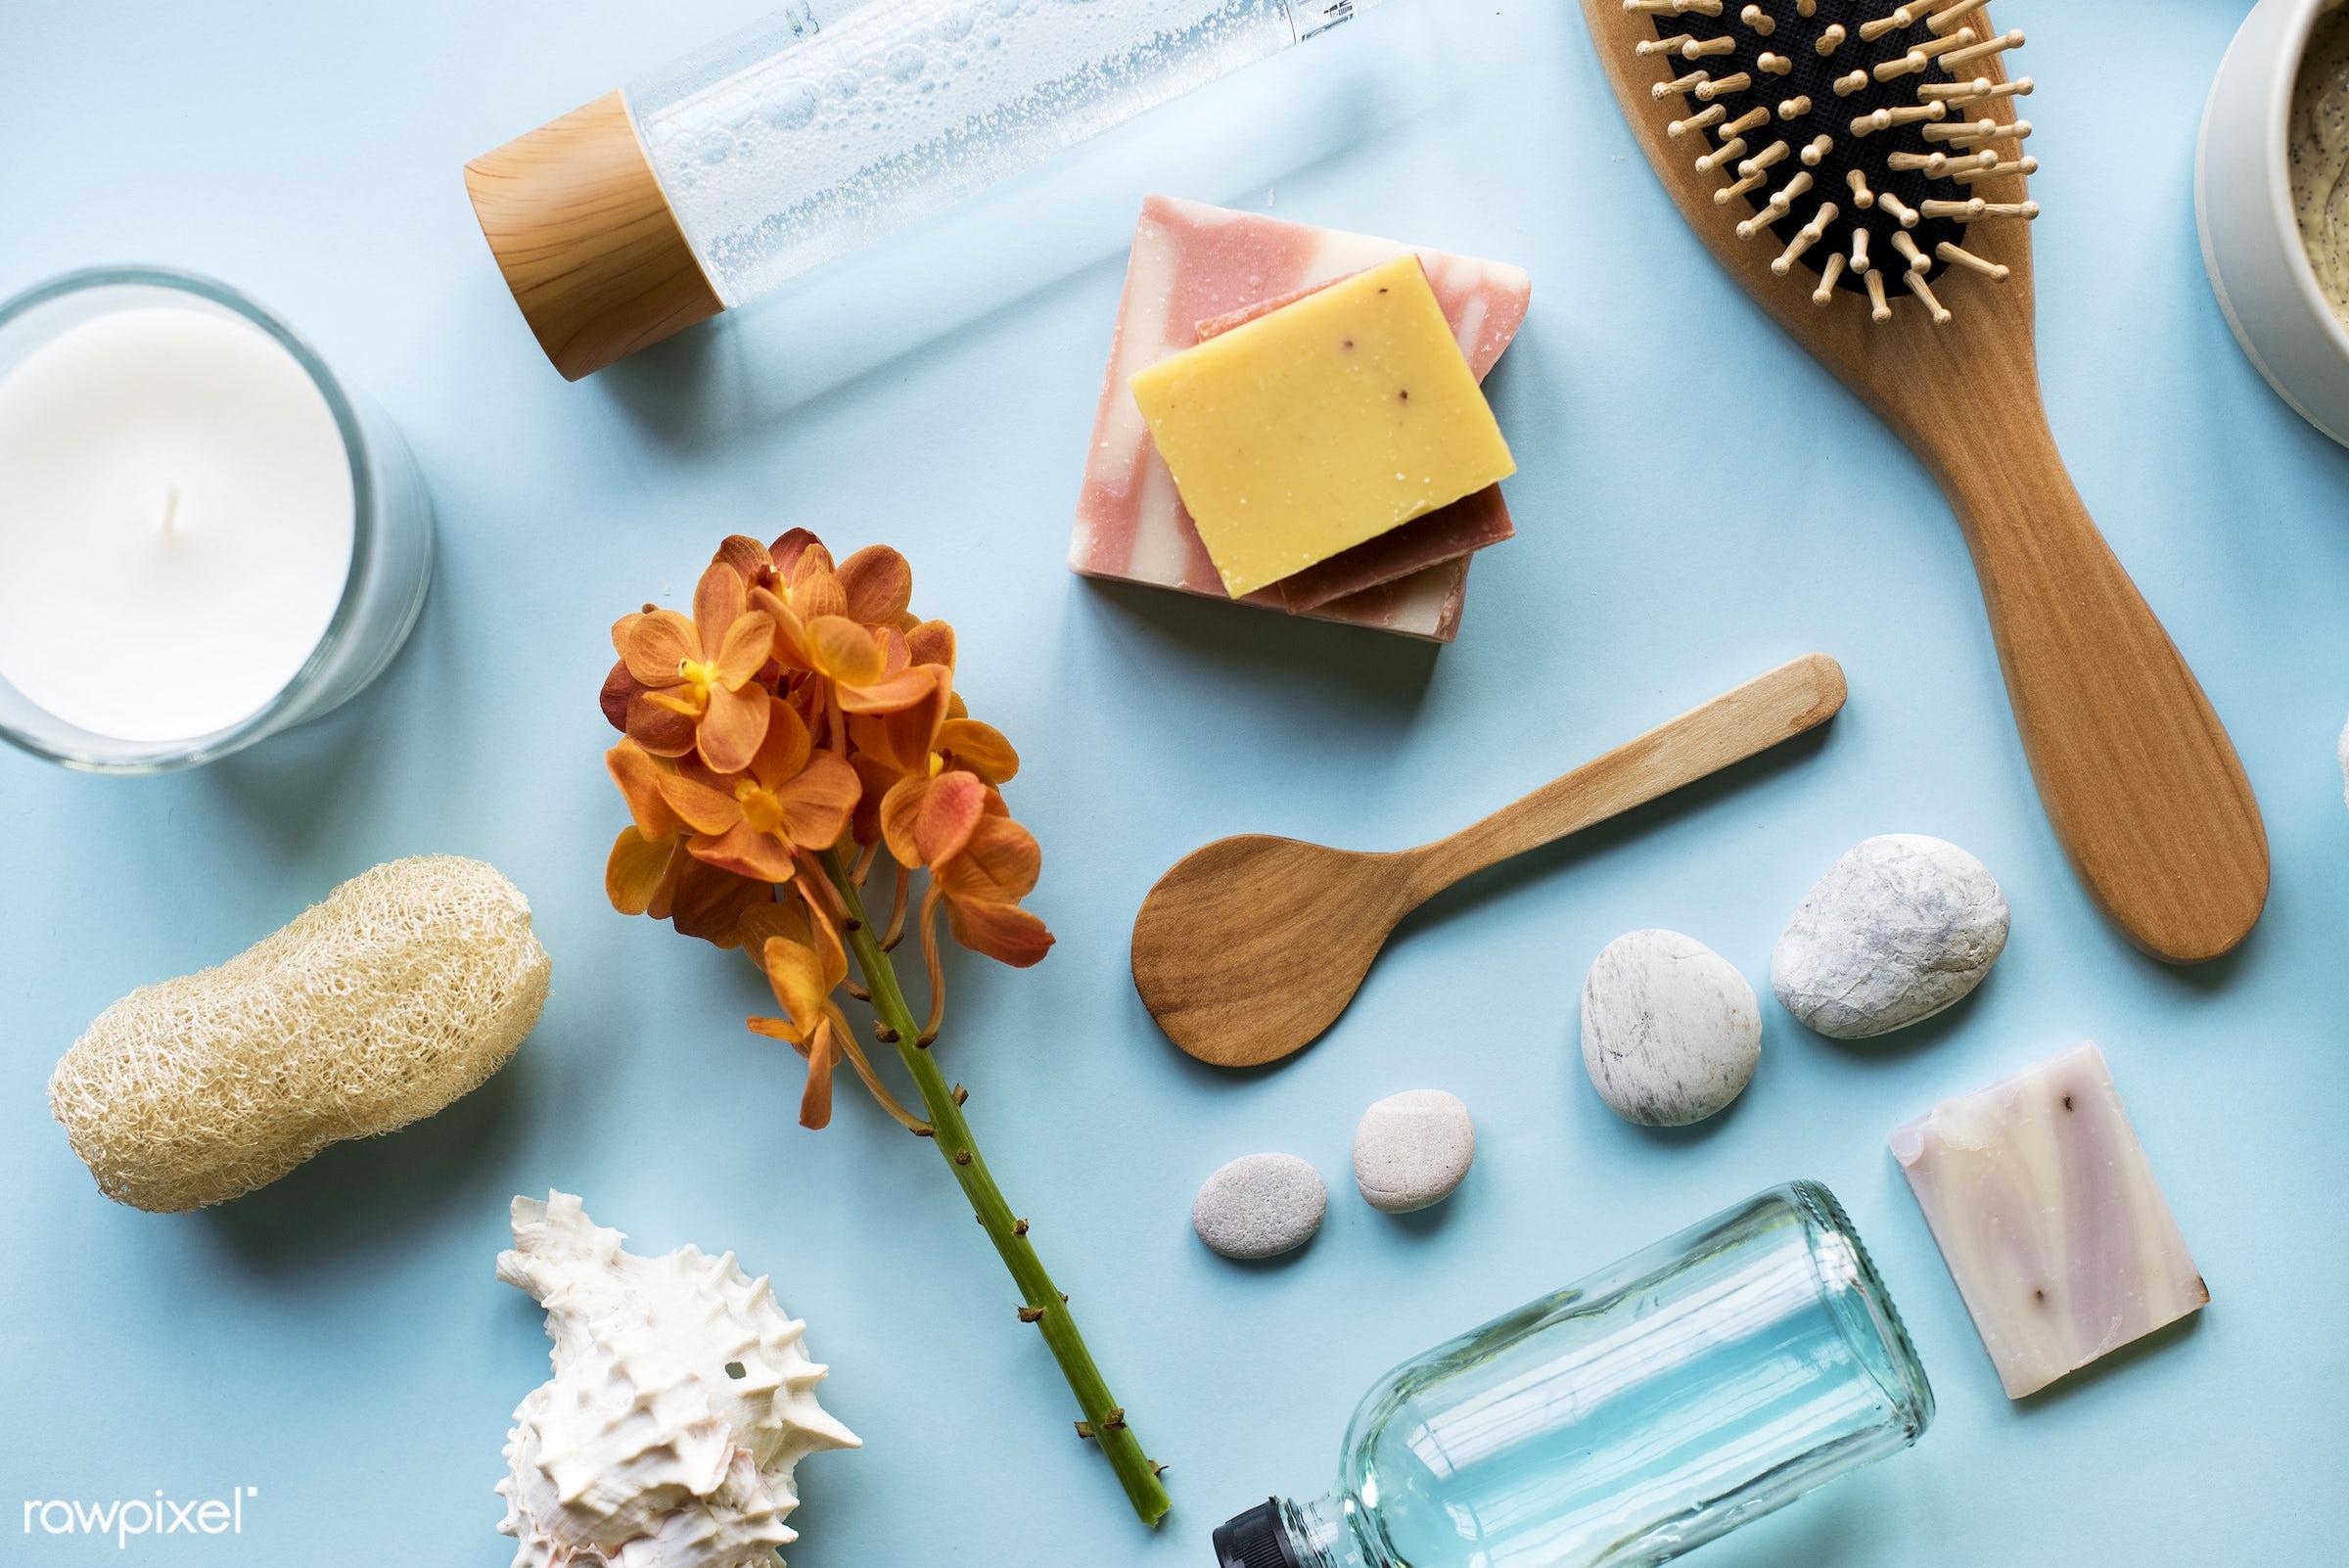 aroma, flatlay, moisturizer, beauty, skin, candle, woman, cosmetics, care, bath, bodycare, spa, aromatherapy, comb, cream,...